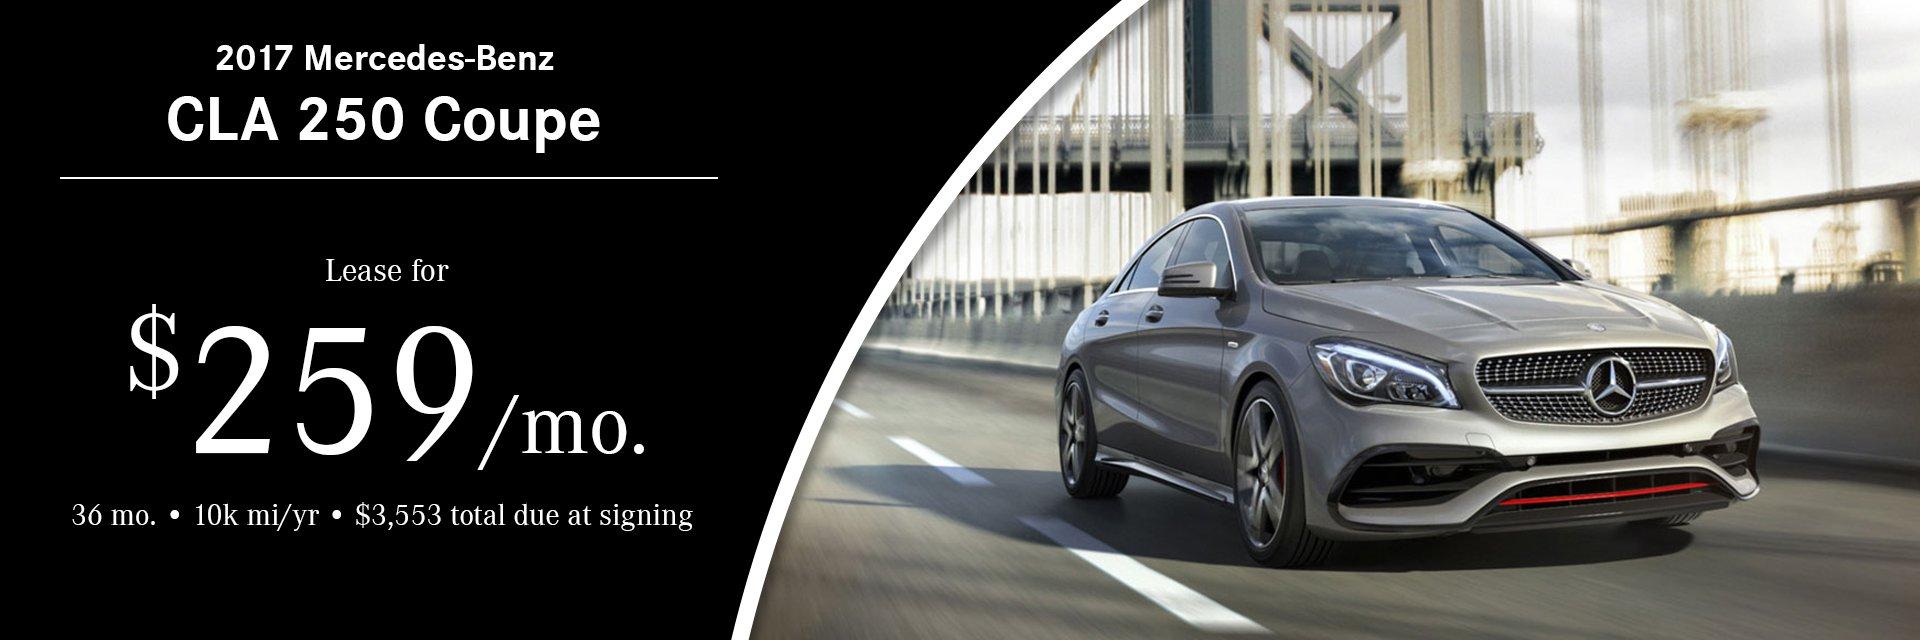 Mercedes Benz Of Westwood New Used Dealership Serving